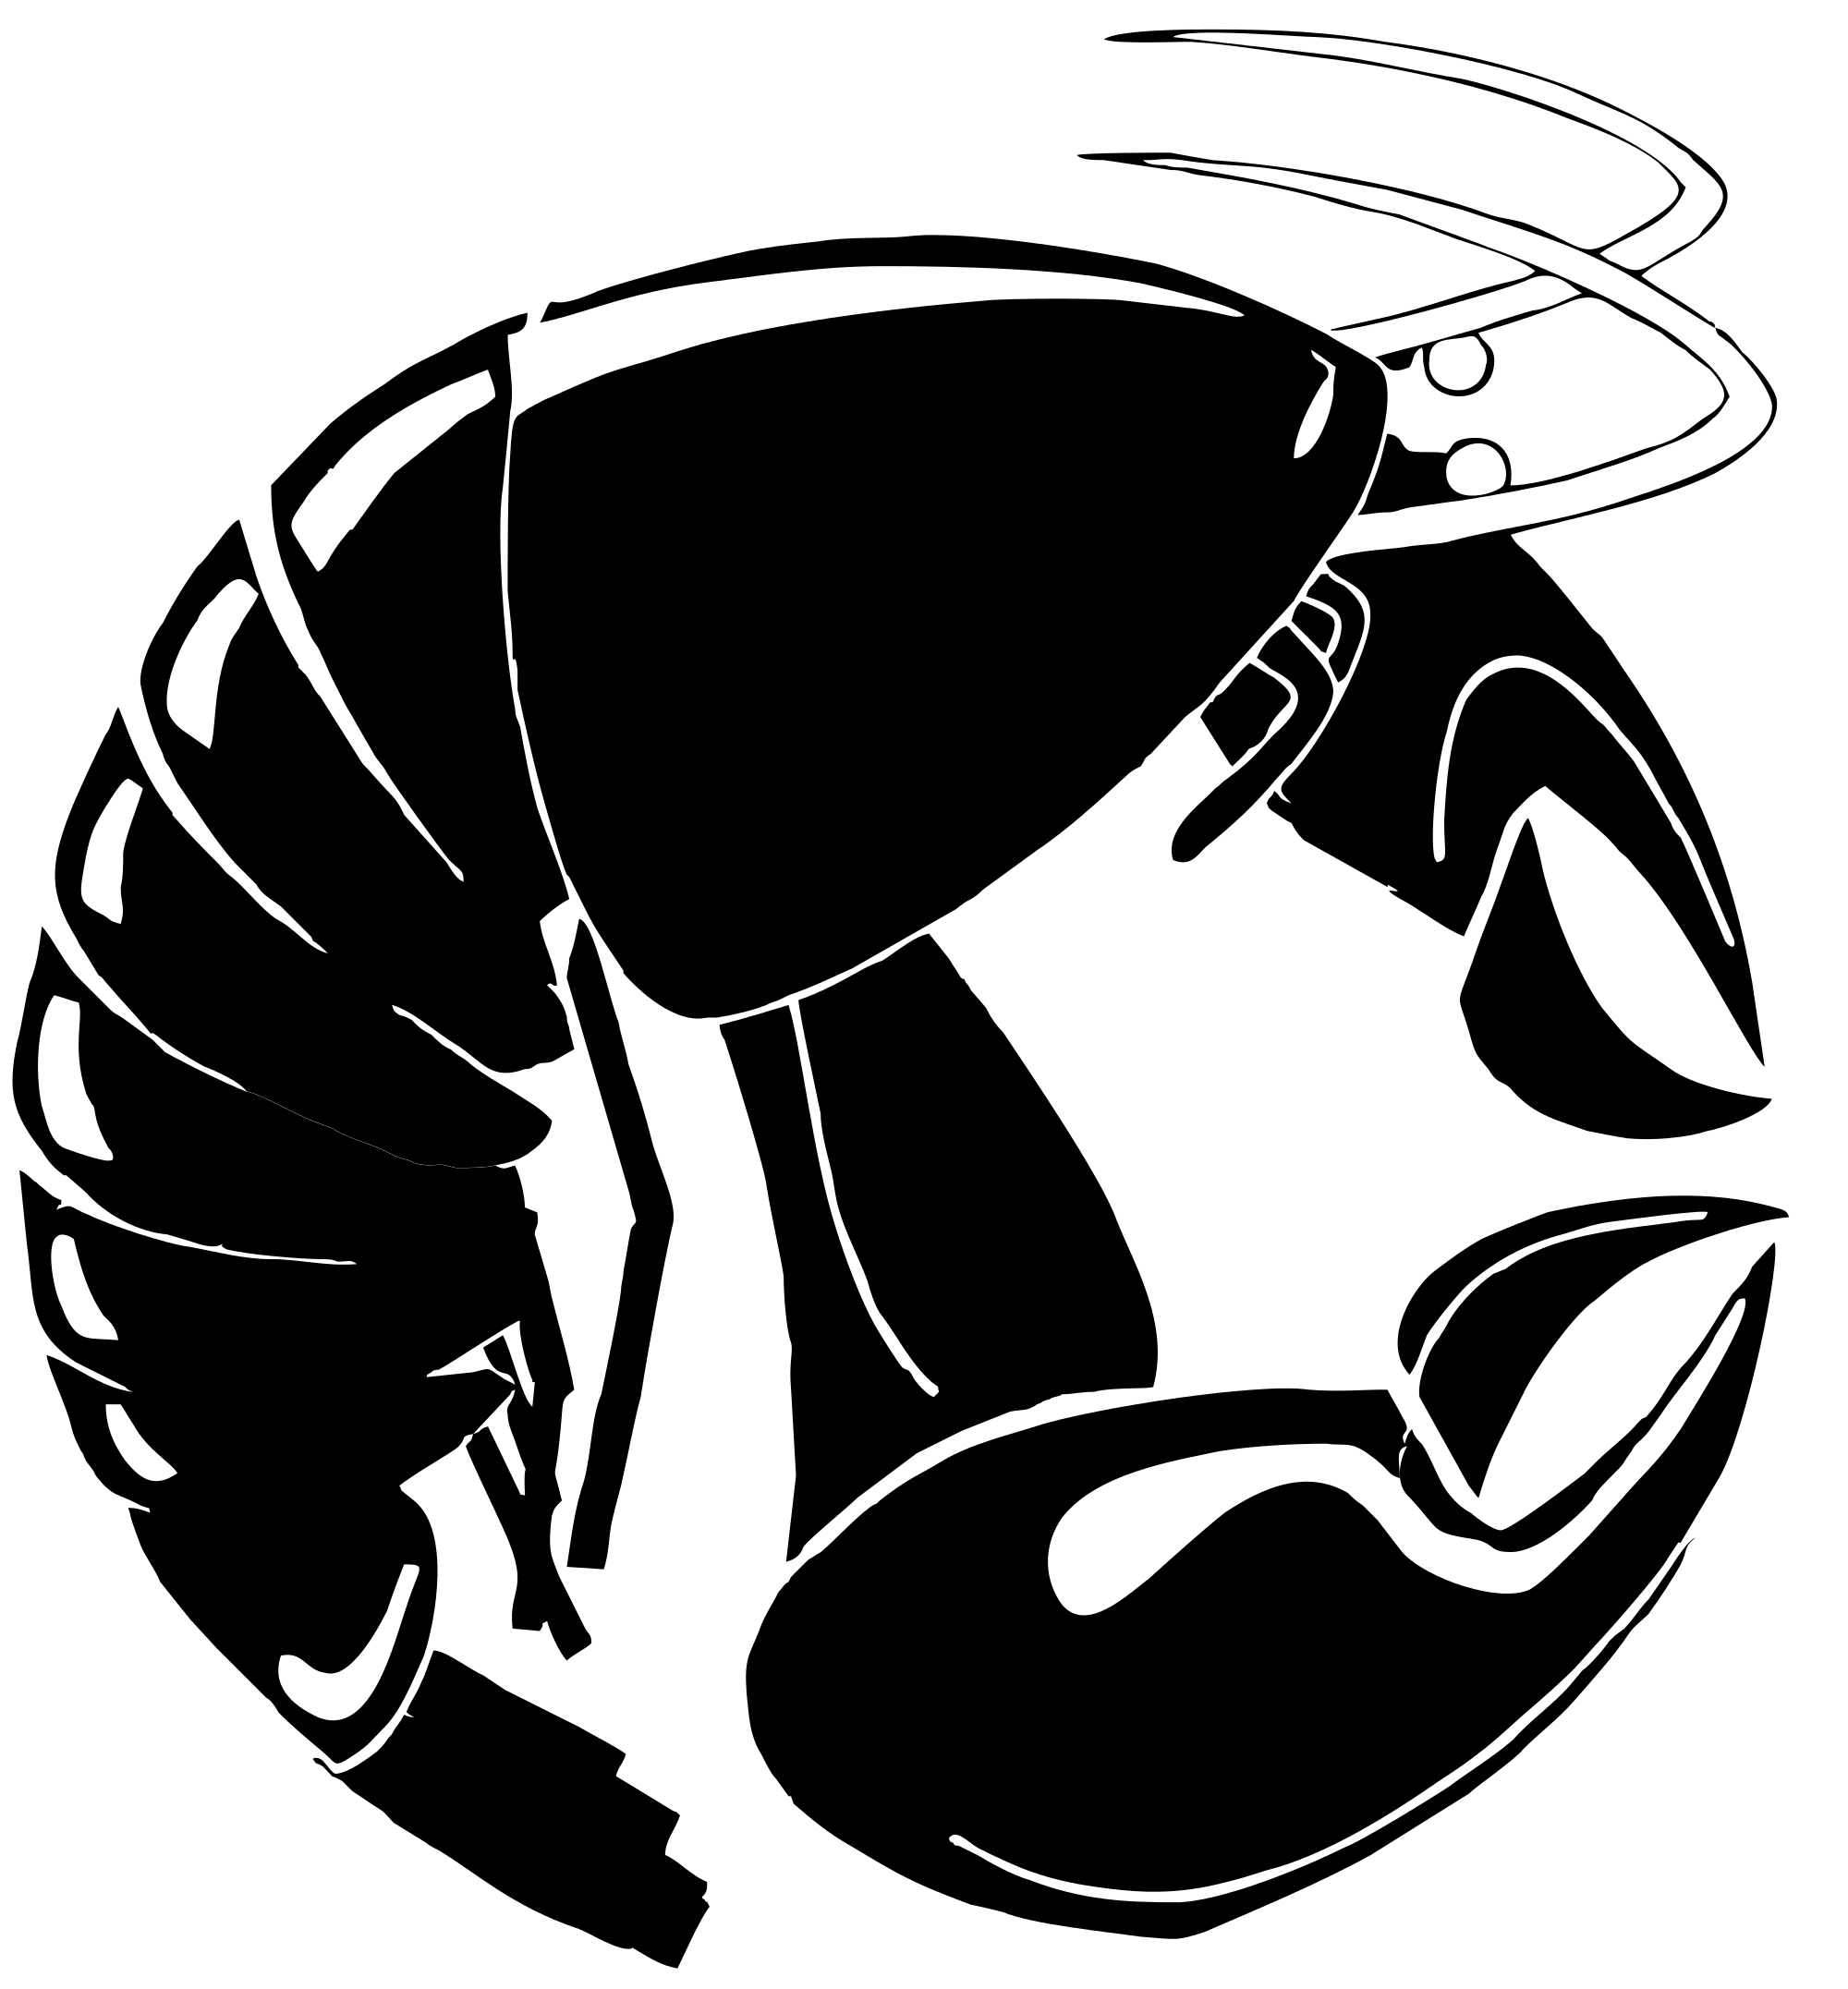 Lobster svg #8, Download drawings